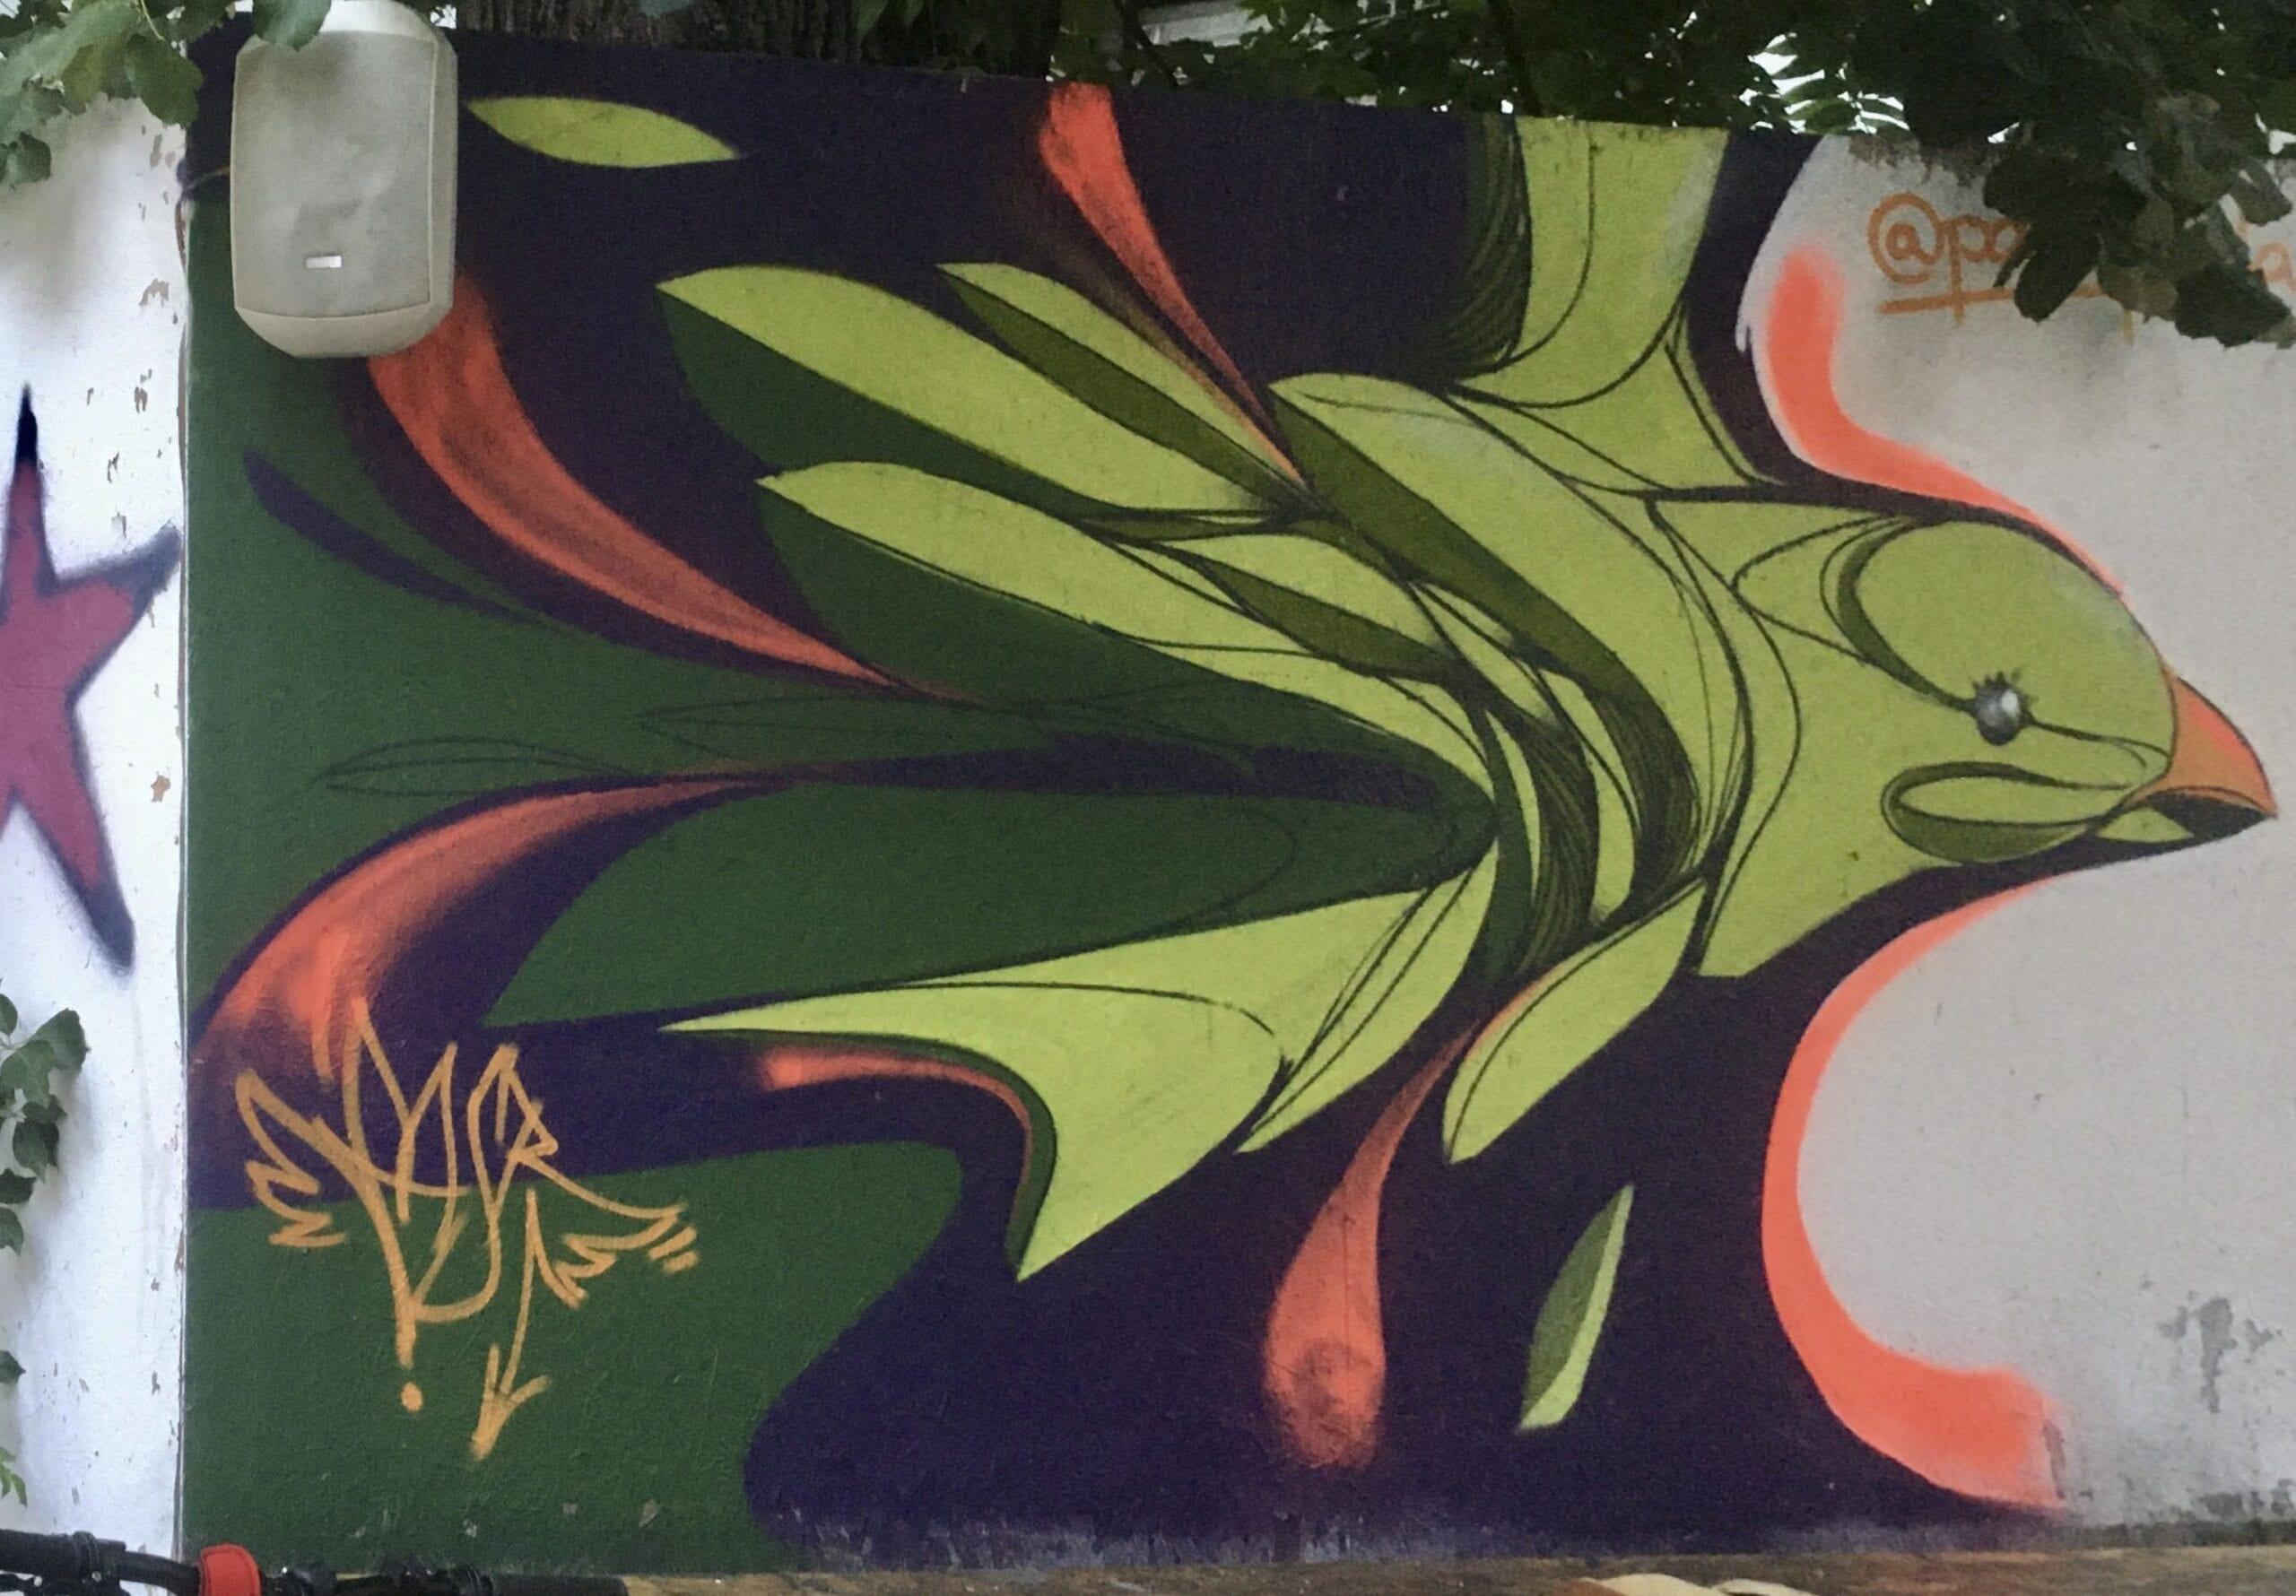 2020 PASR Passtrada - street art at Spatiul M60